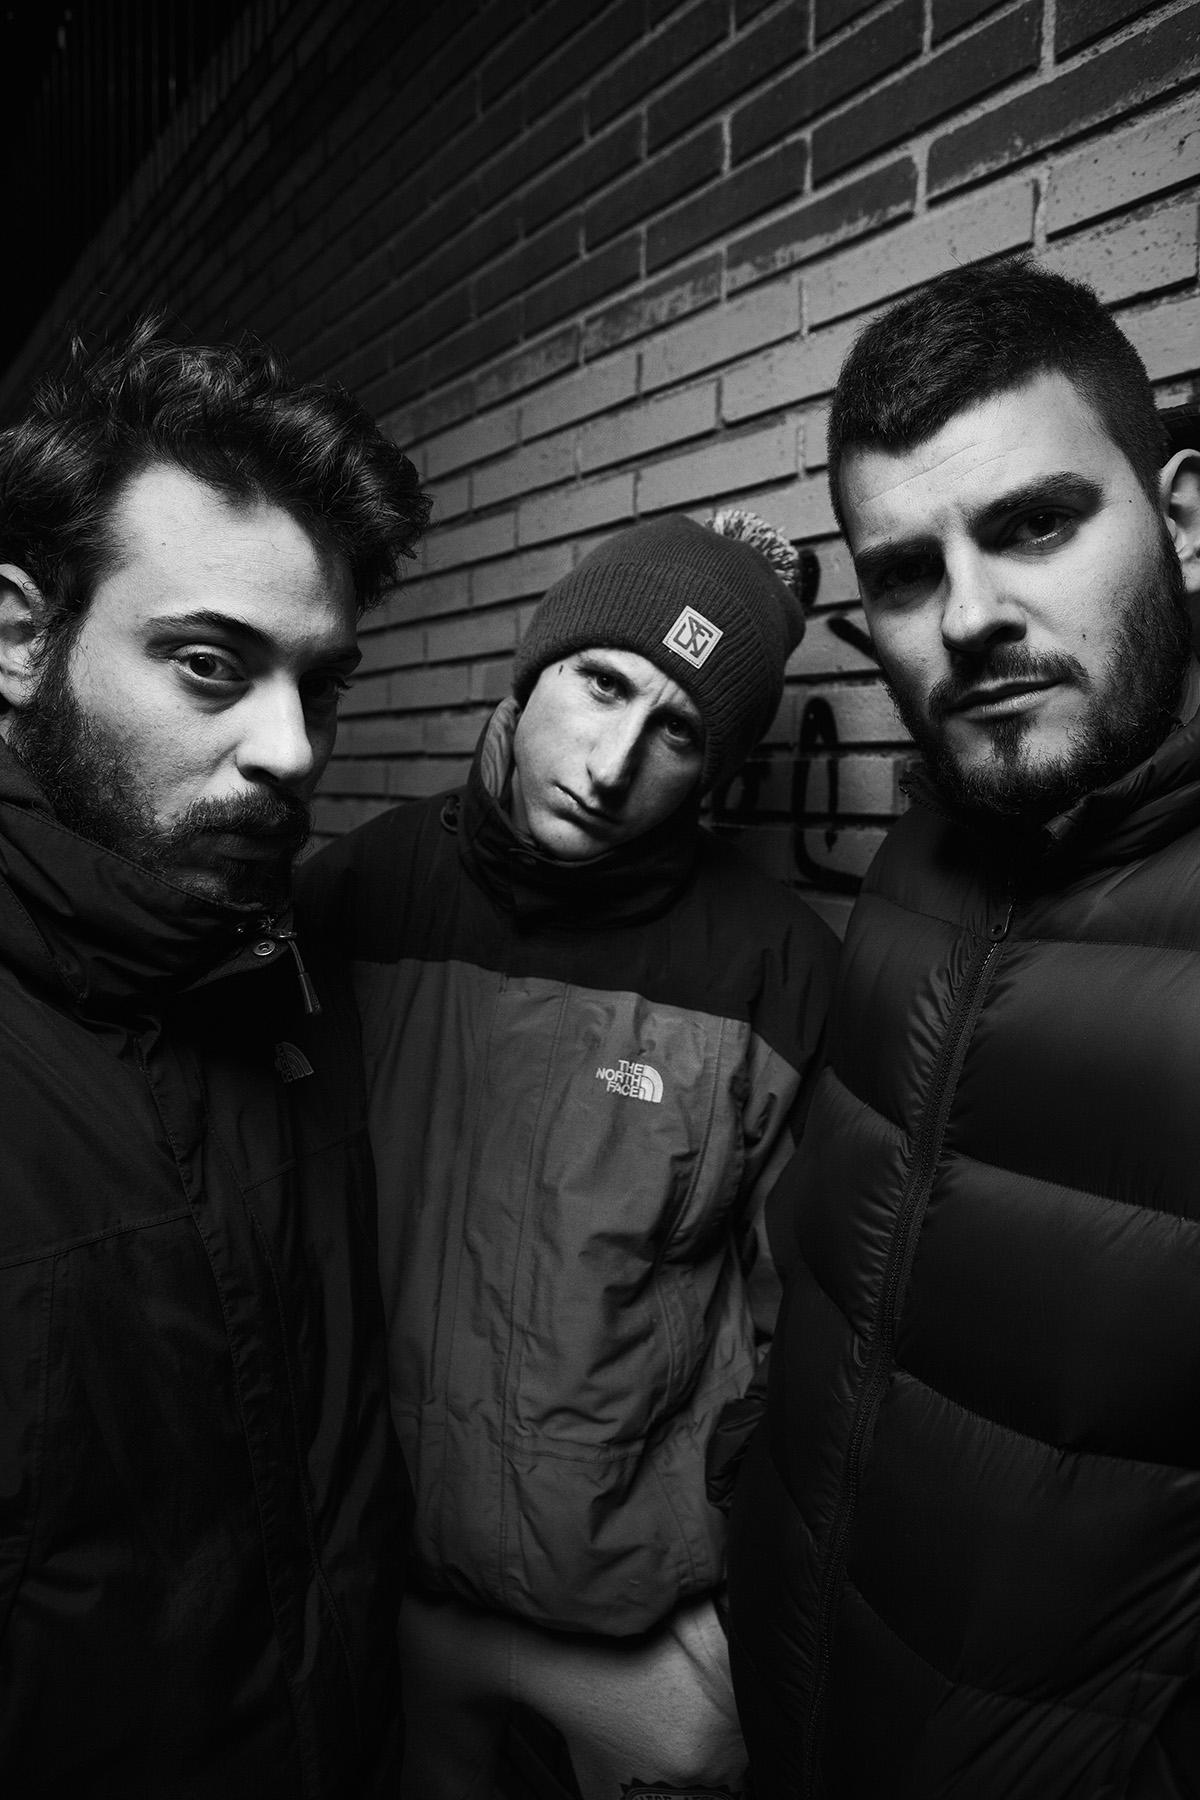 Oscar-arribas-photography-fotografo-reportaje-origenes-rap-hiphop-hip-hop-burgos-victor-rutty-viti-hurto-rober-rel-pyro-djkaef-kaef-thelouk-the-louk-portrait-retrato-editorial-music-band-musicos-street-real-78.jpg